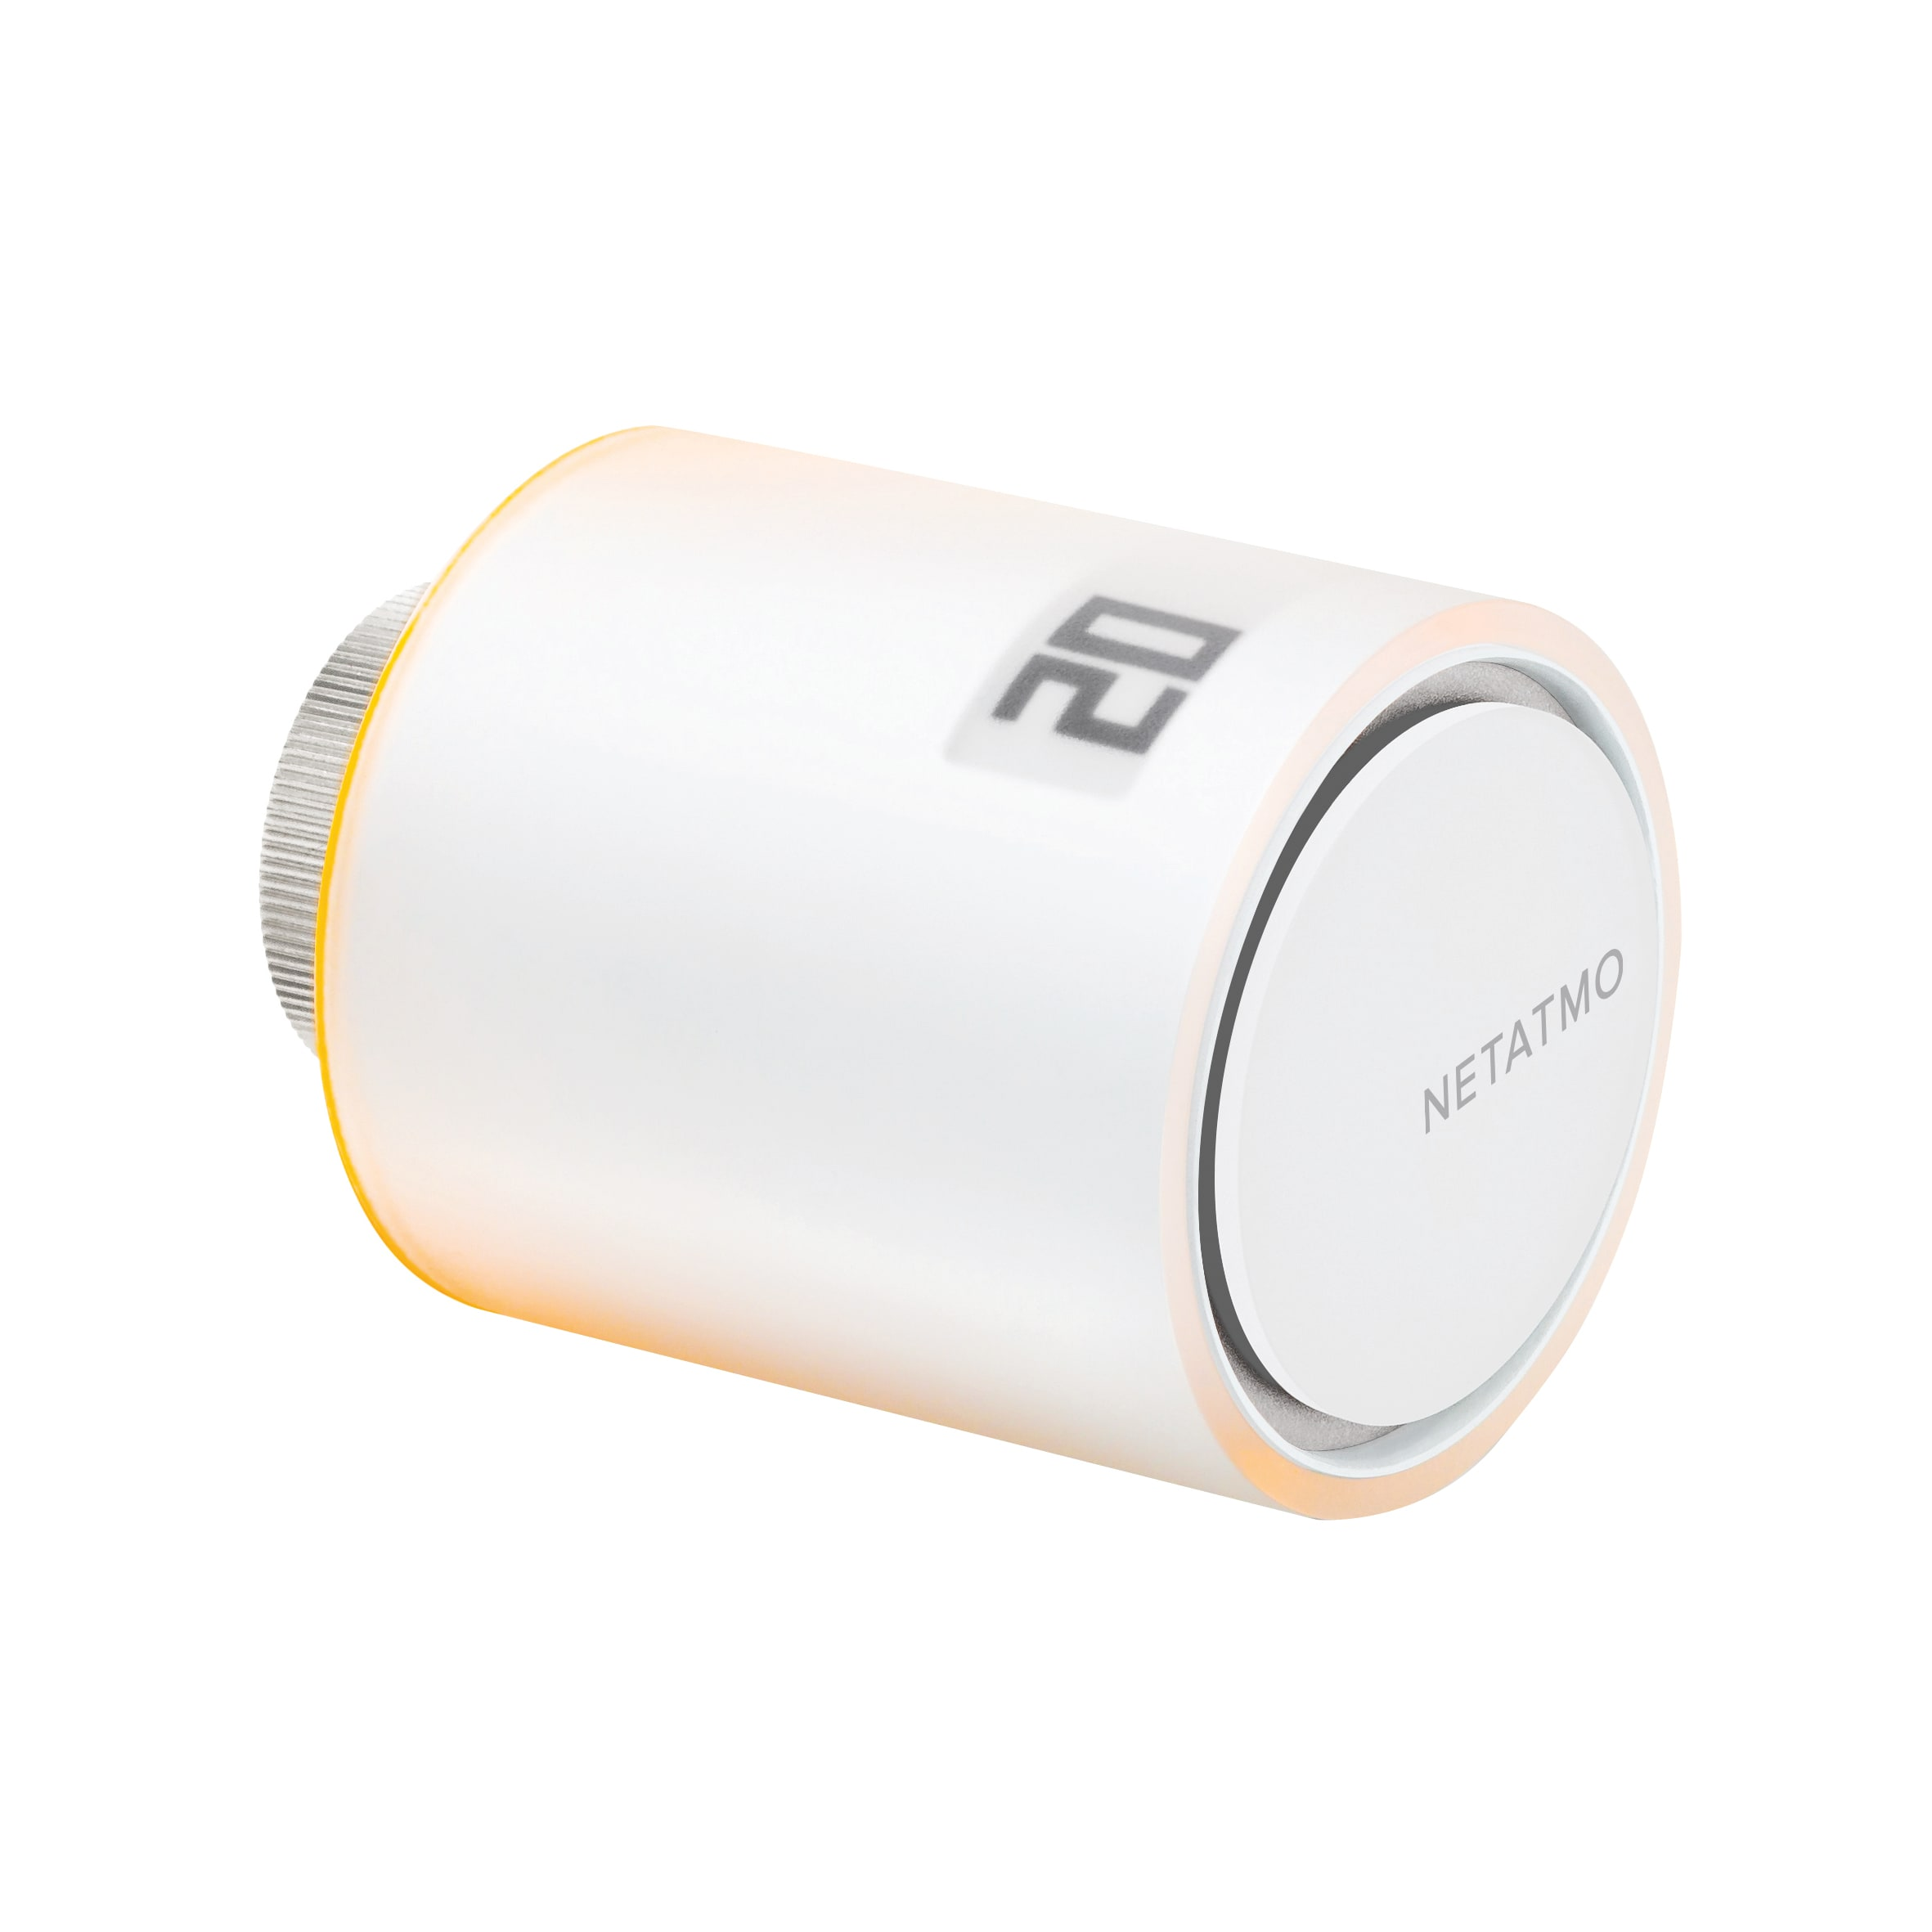 Valvola Termostatica Netatmo Smart Wi Fi Wireless Prezzi E Offerte